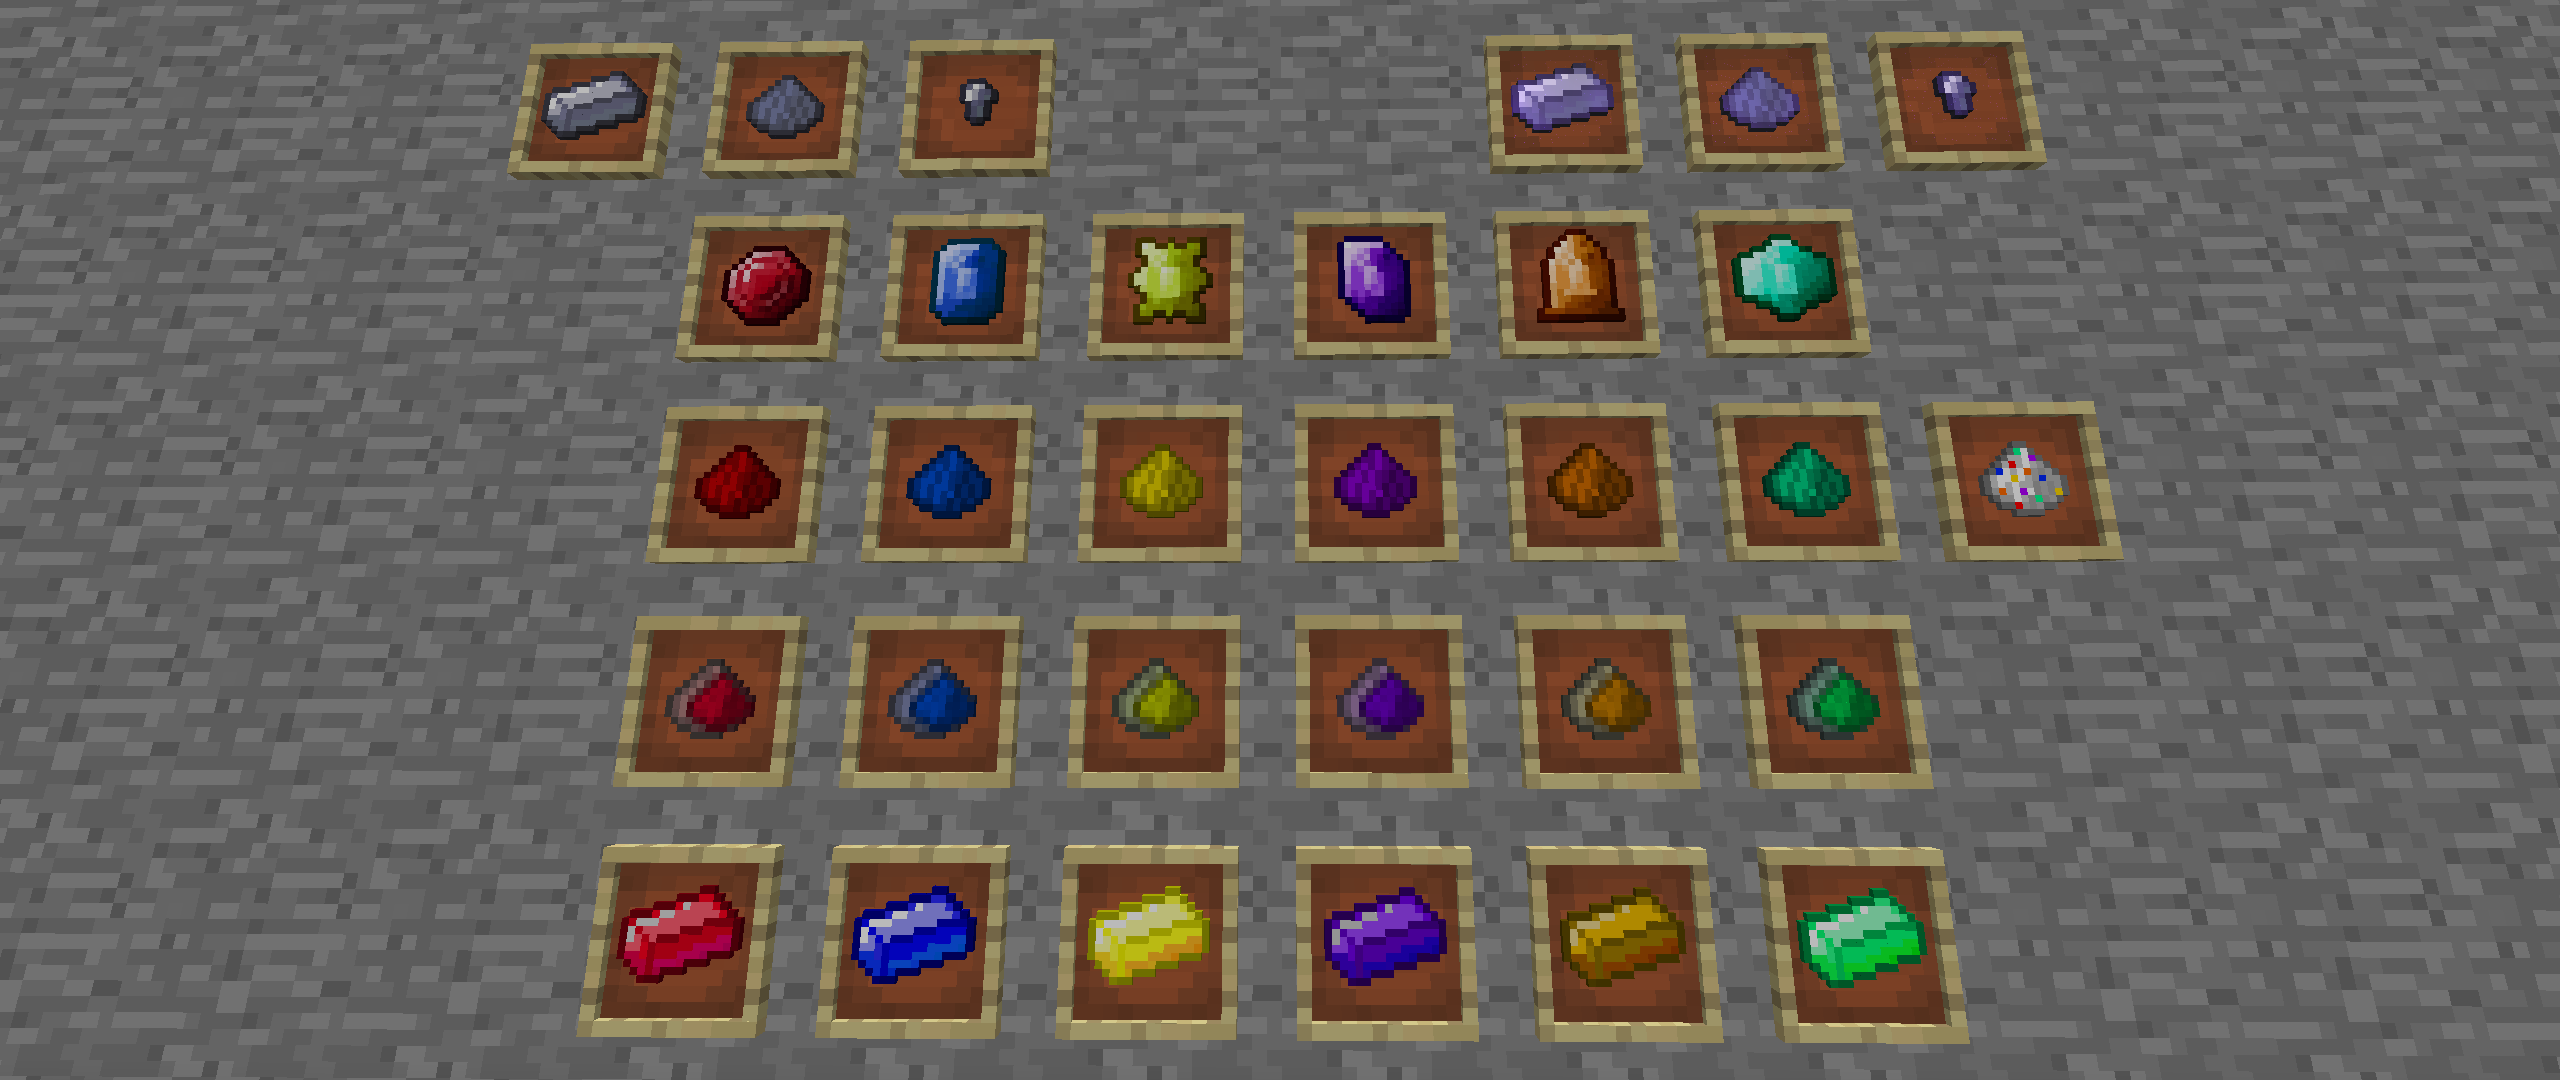 Мистическая руда в Майнкрафт